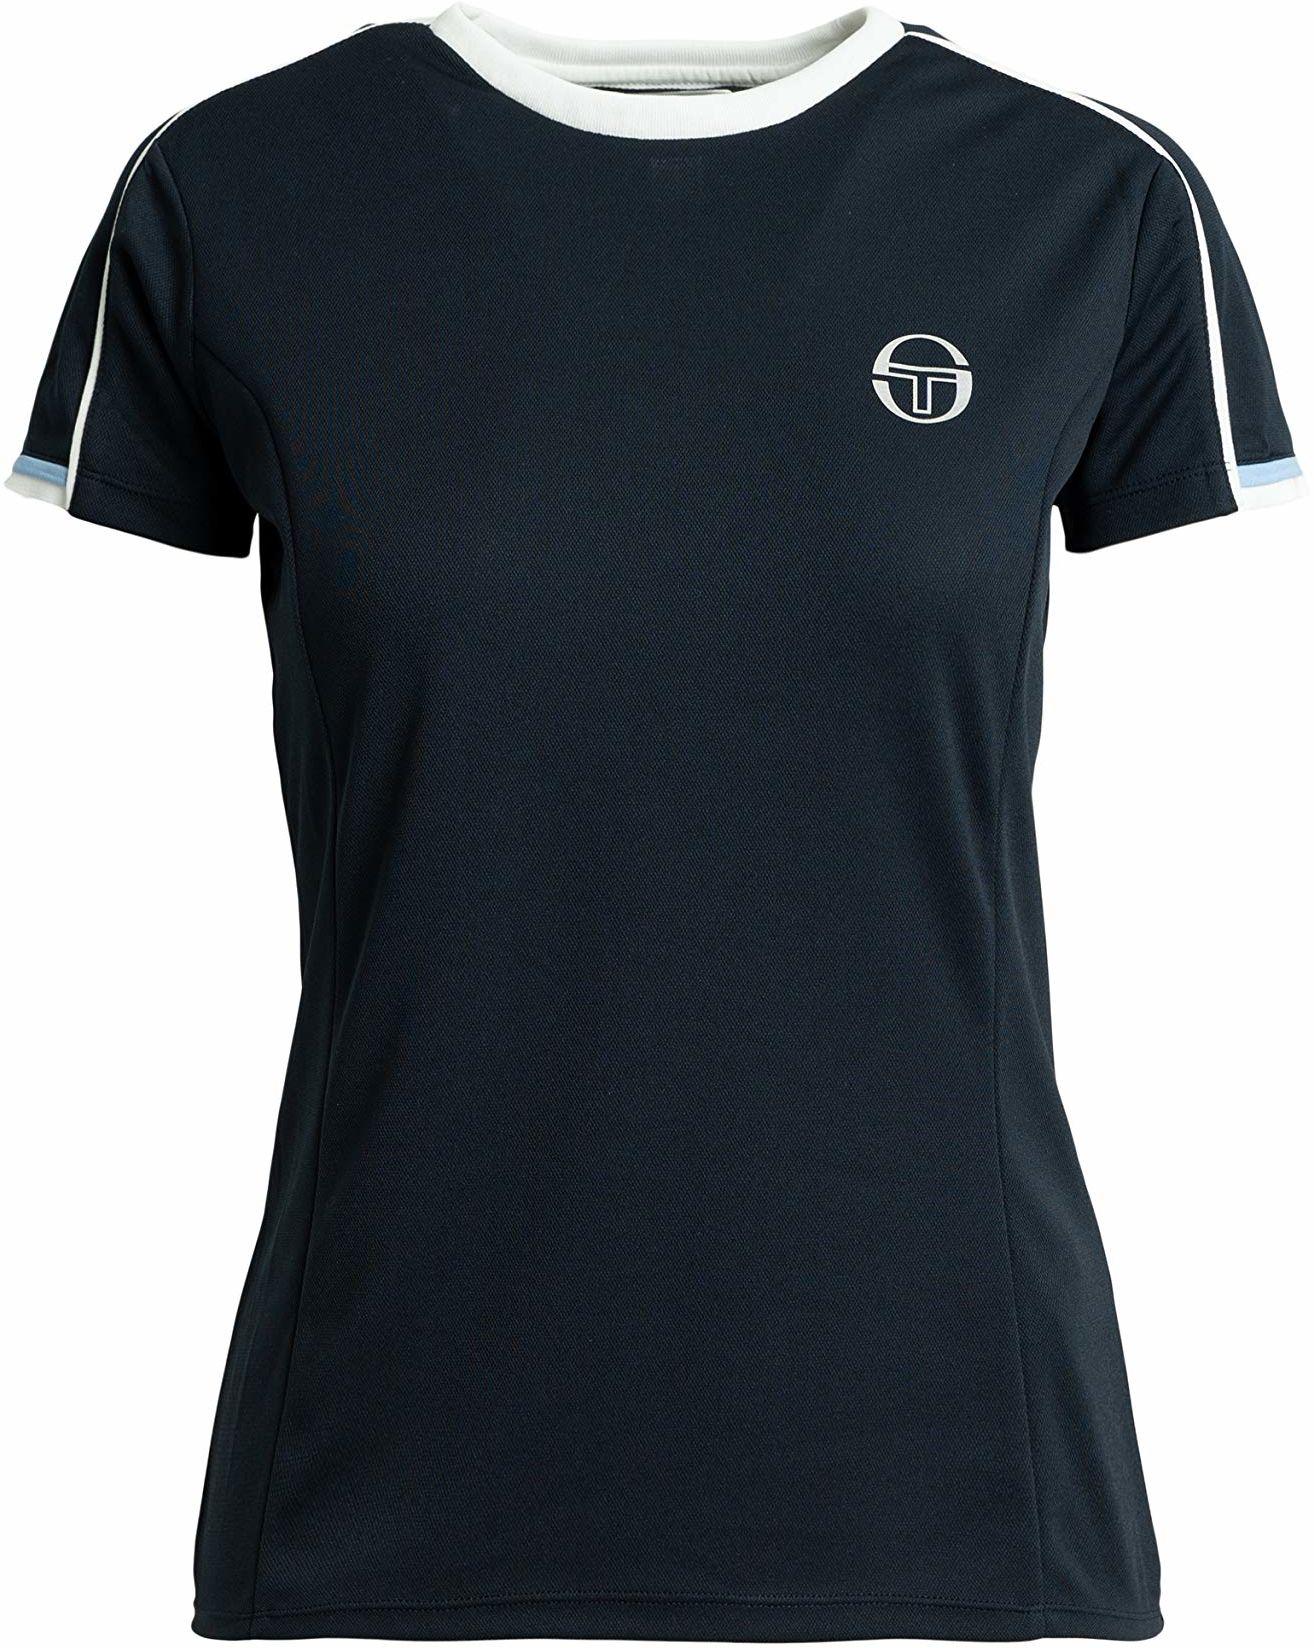 Sergio Tacchini Damski T-shirt Pliage T-shirt damski niebieski granatowy/biały XS